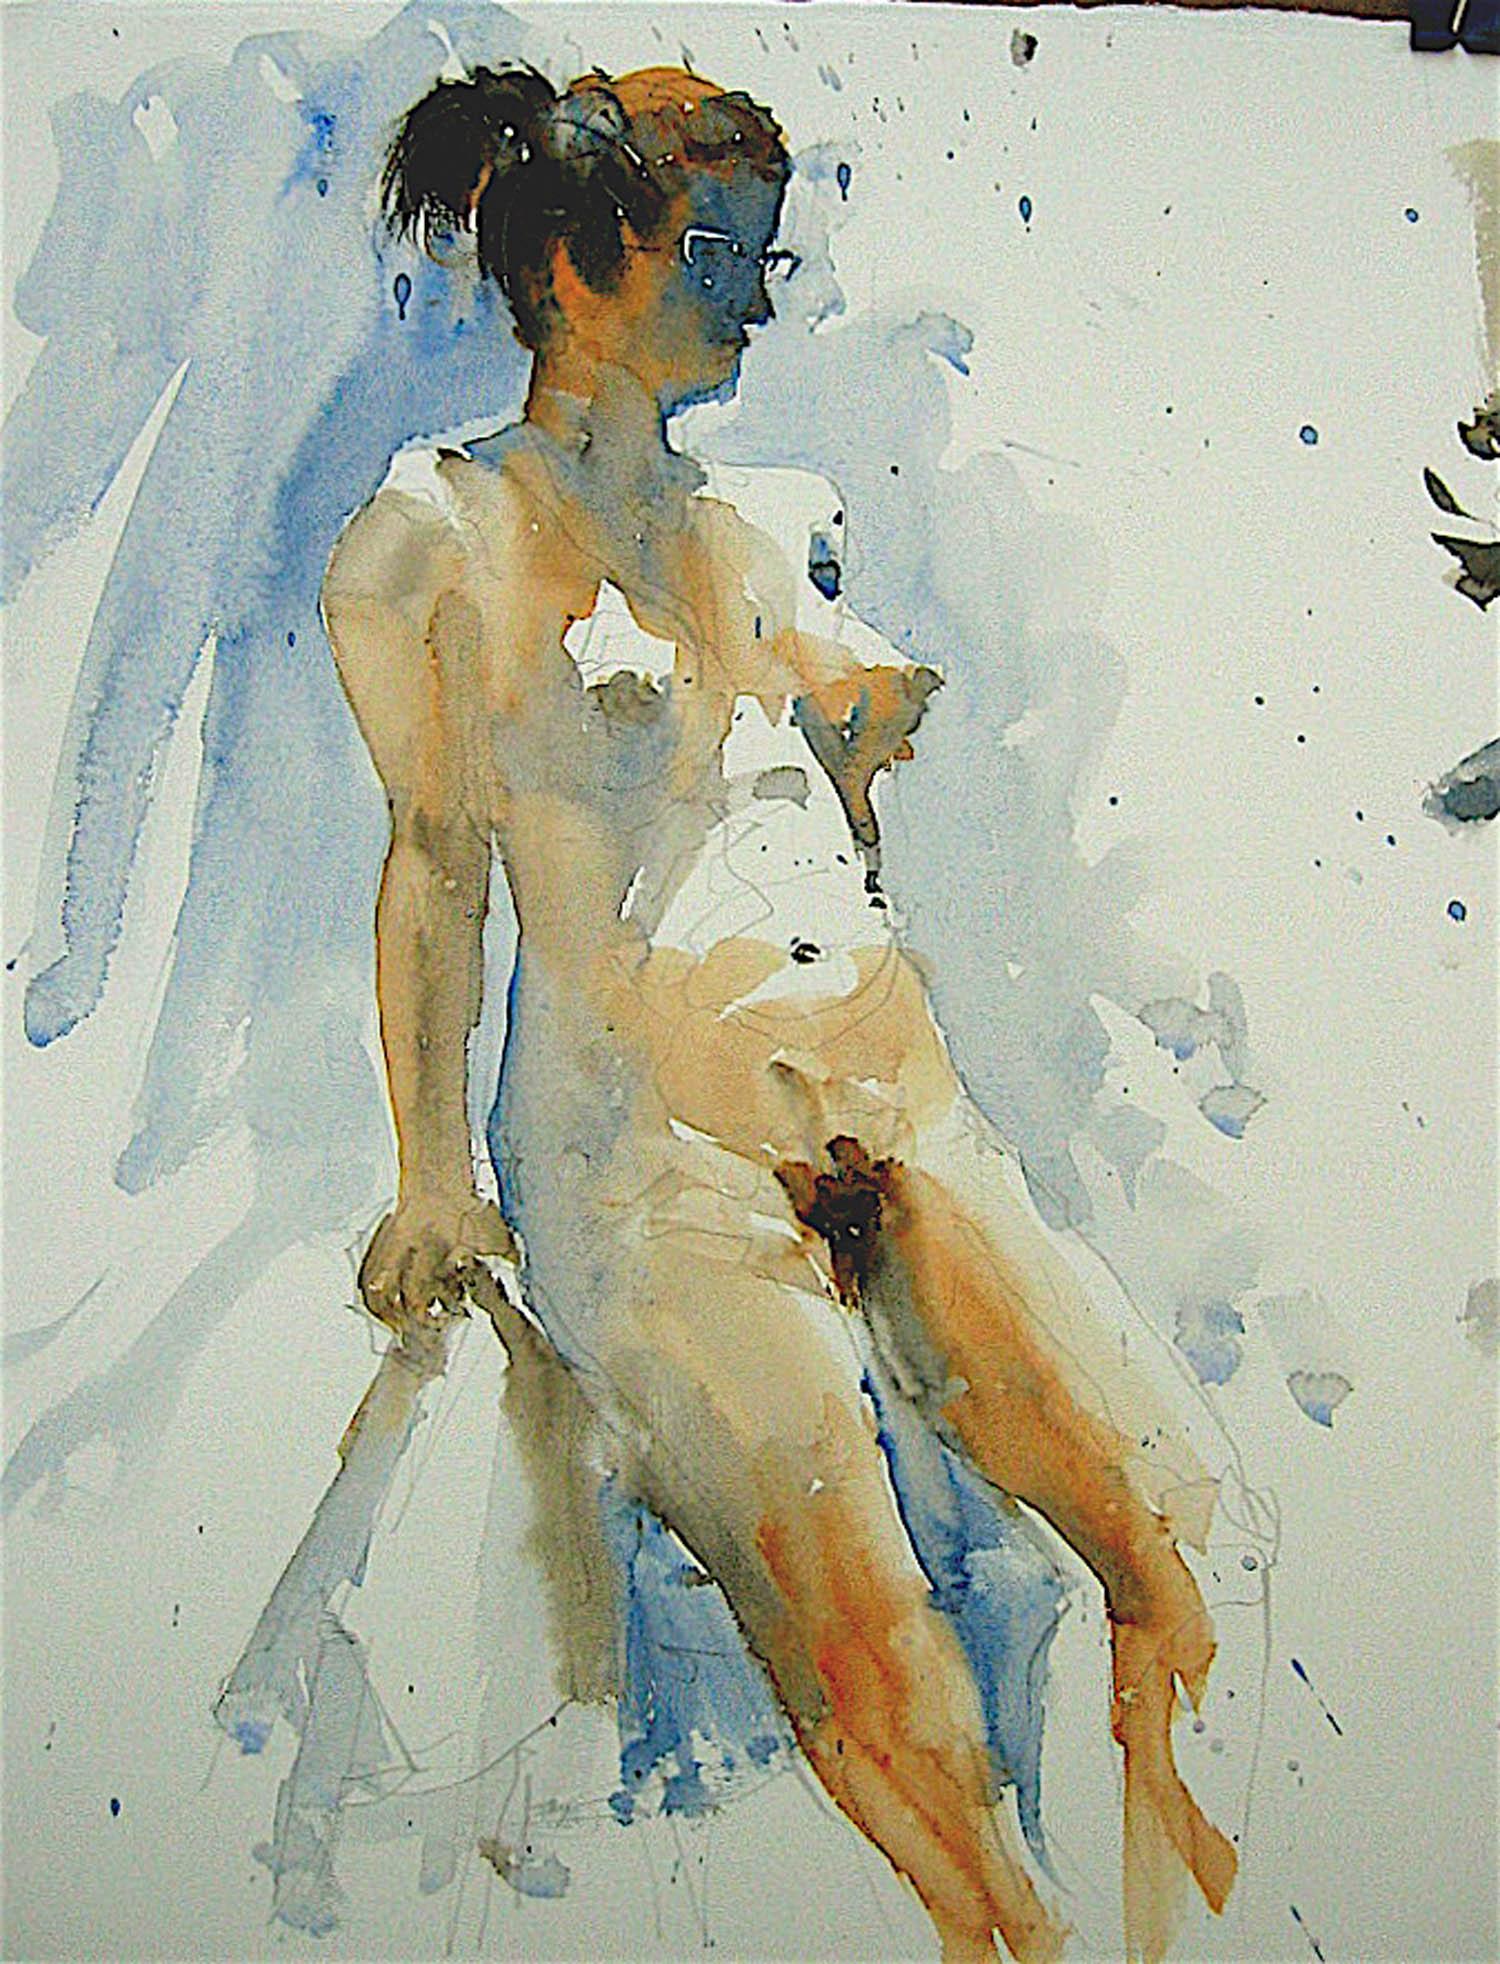 Watercolour: 21 x 15in